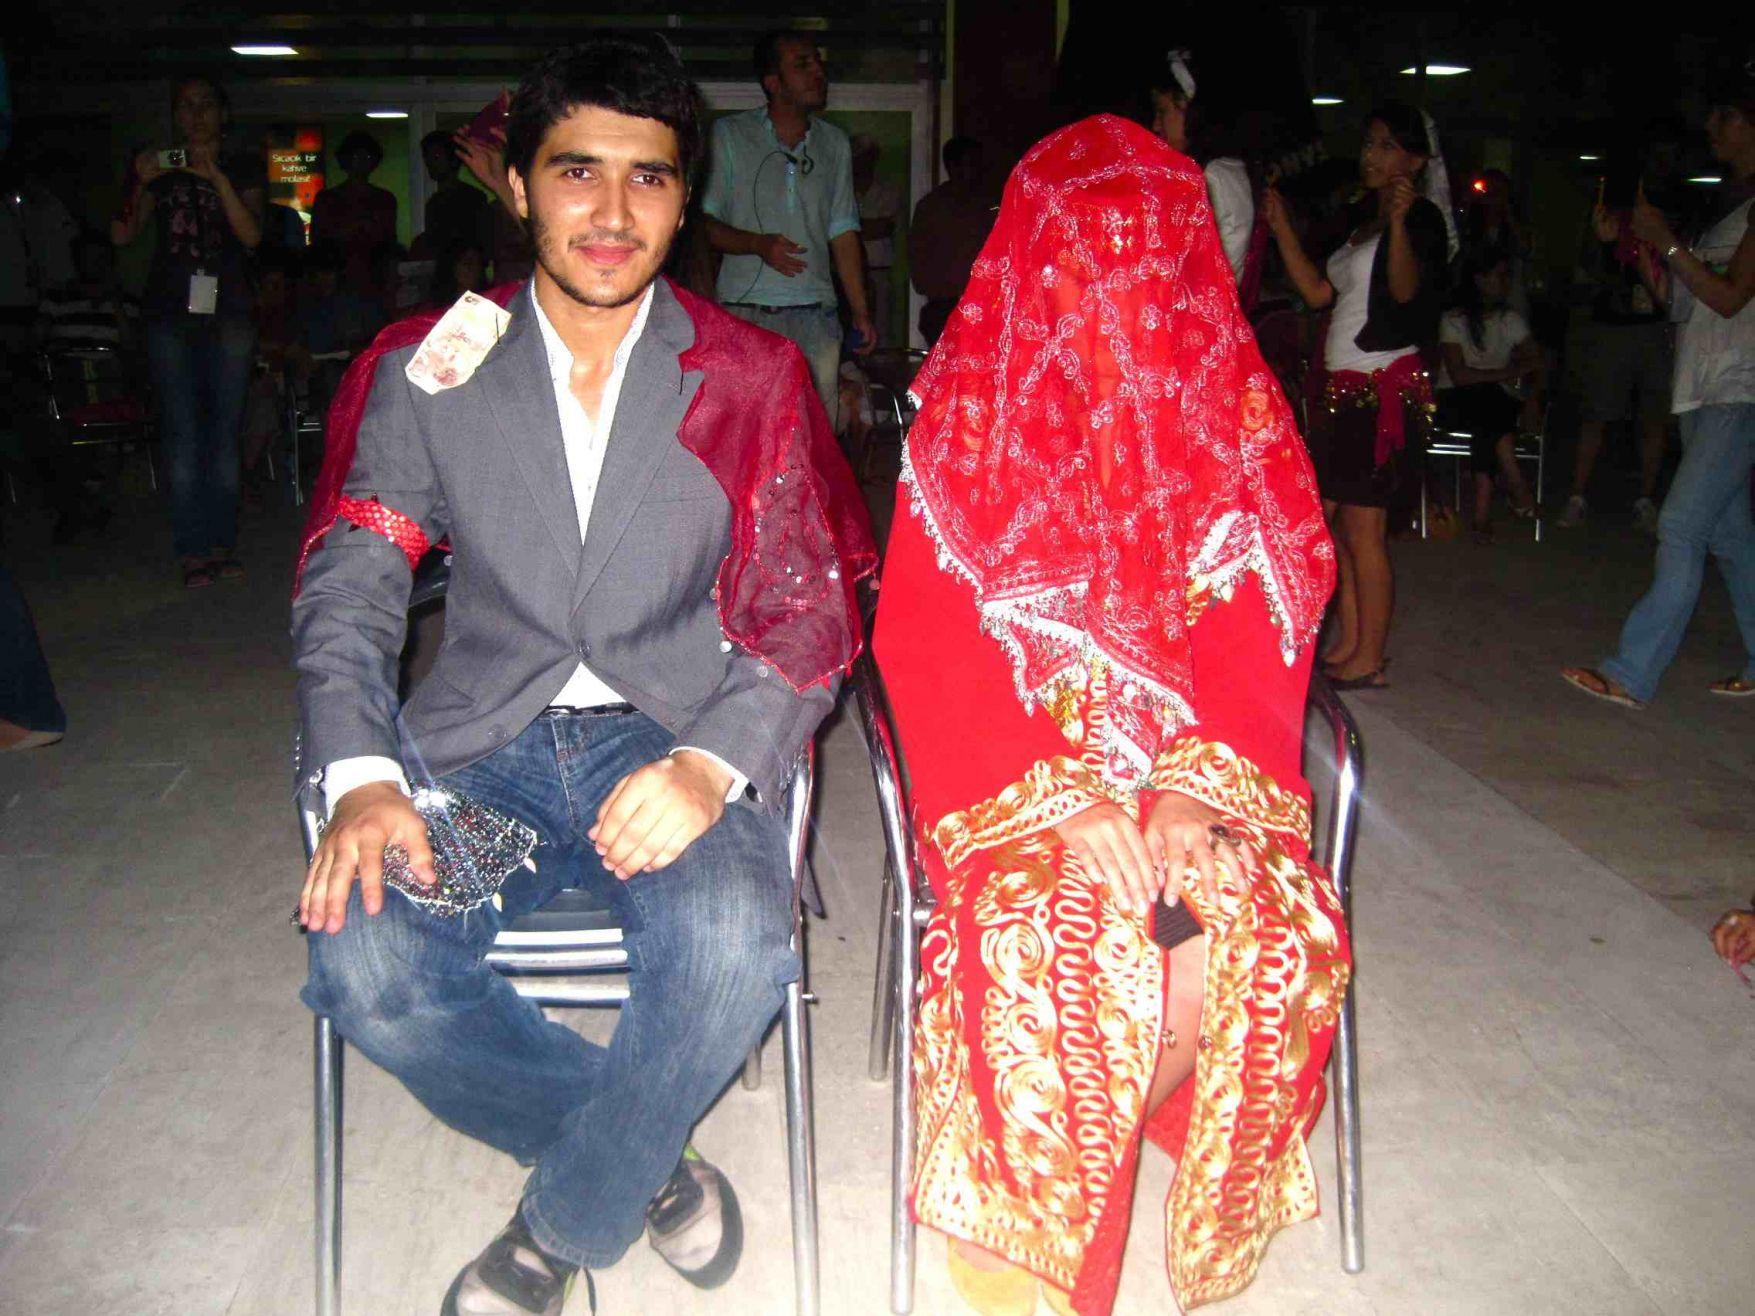 Pin by jooana on wedding ideas for you pinterest turkish wedding